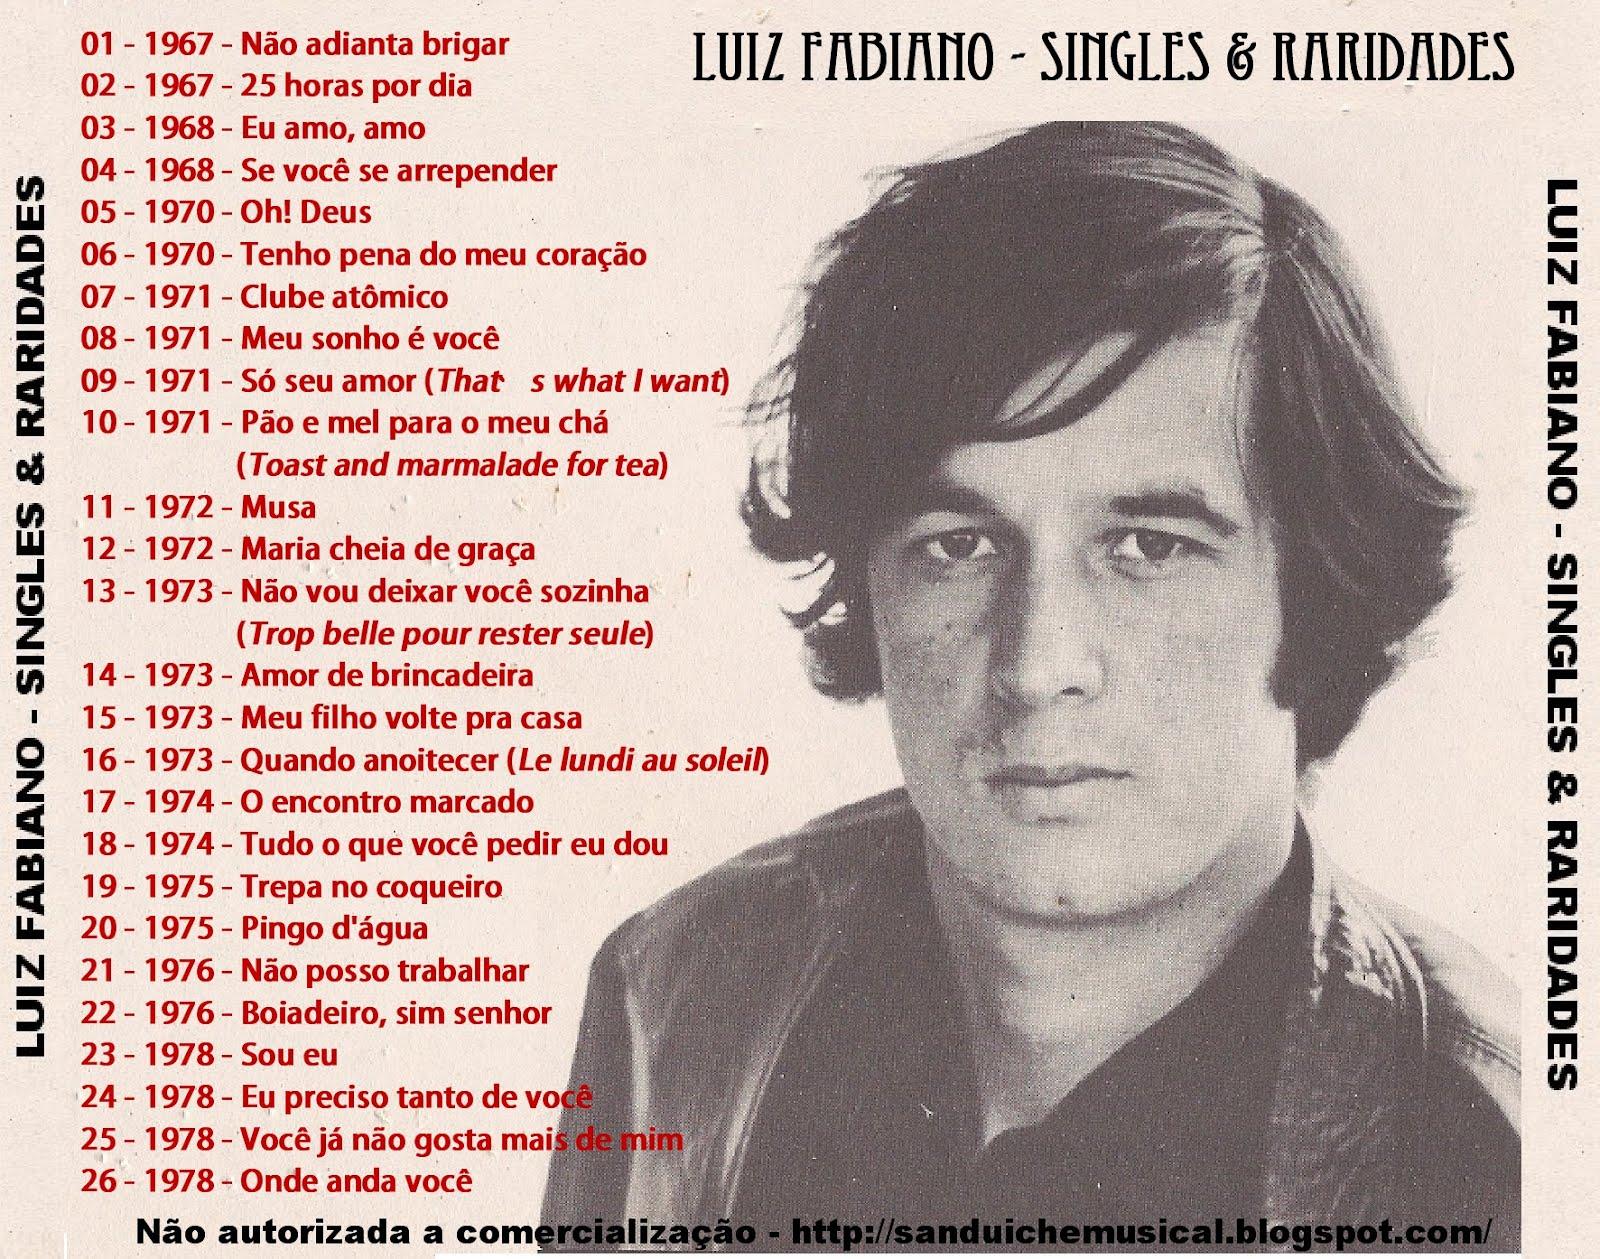 6b25d9238cc SanduícheMusical  Luiz Fabiano - Singles   Raridades (Coletânea)